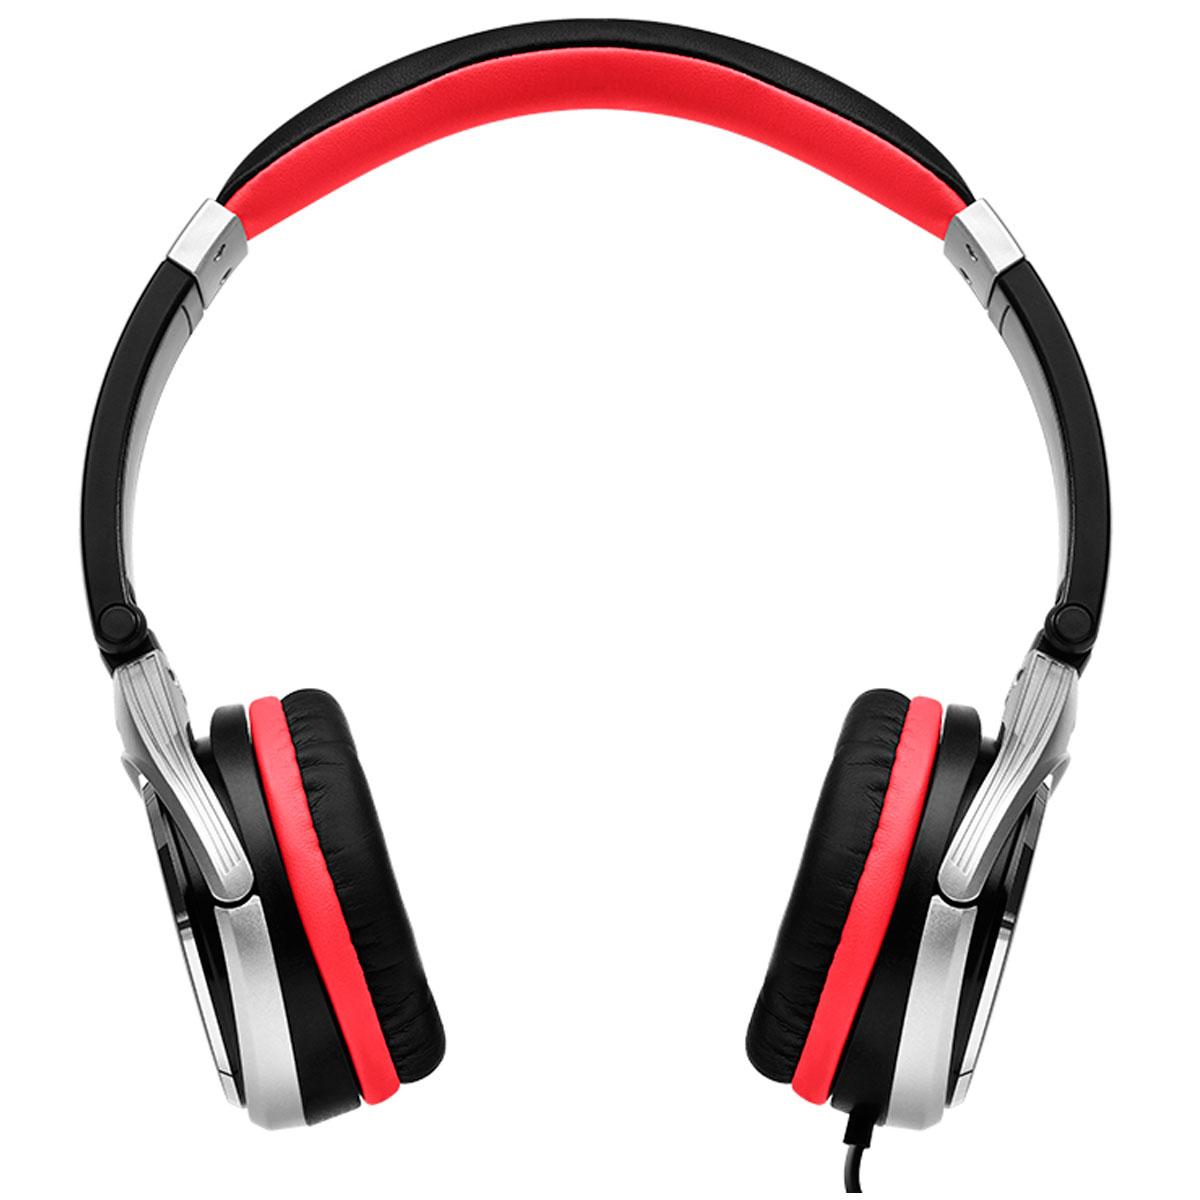 Fone de Ouvido On-ear p/ DJ 20Hz - 20KHz 32 Ohms - HF 150 Numark